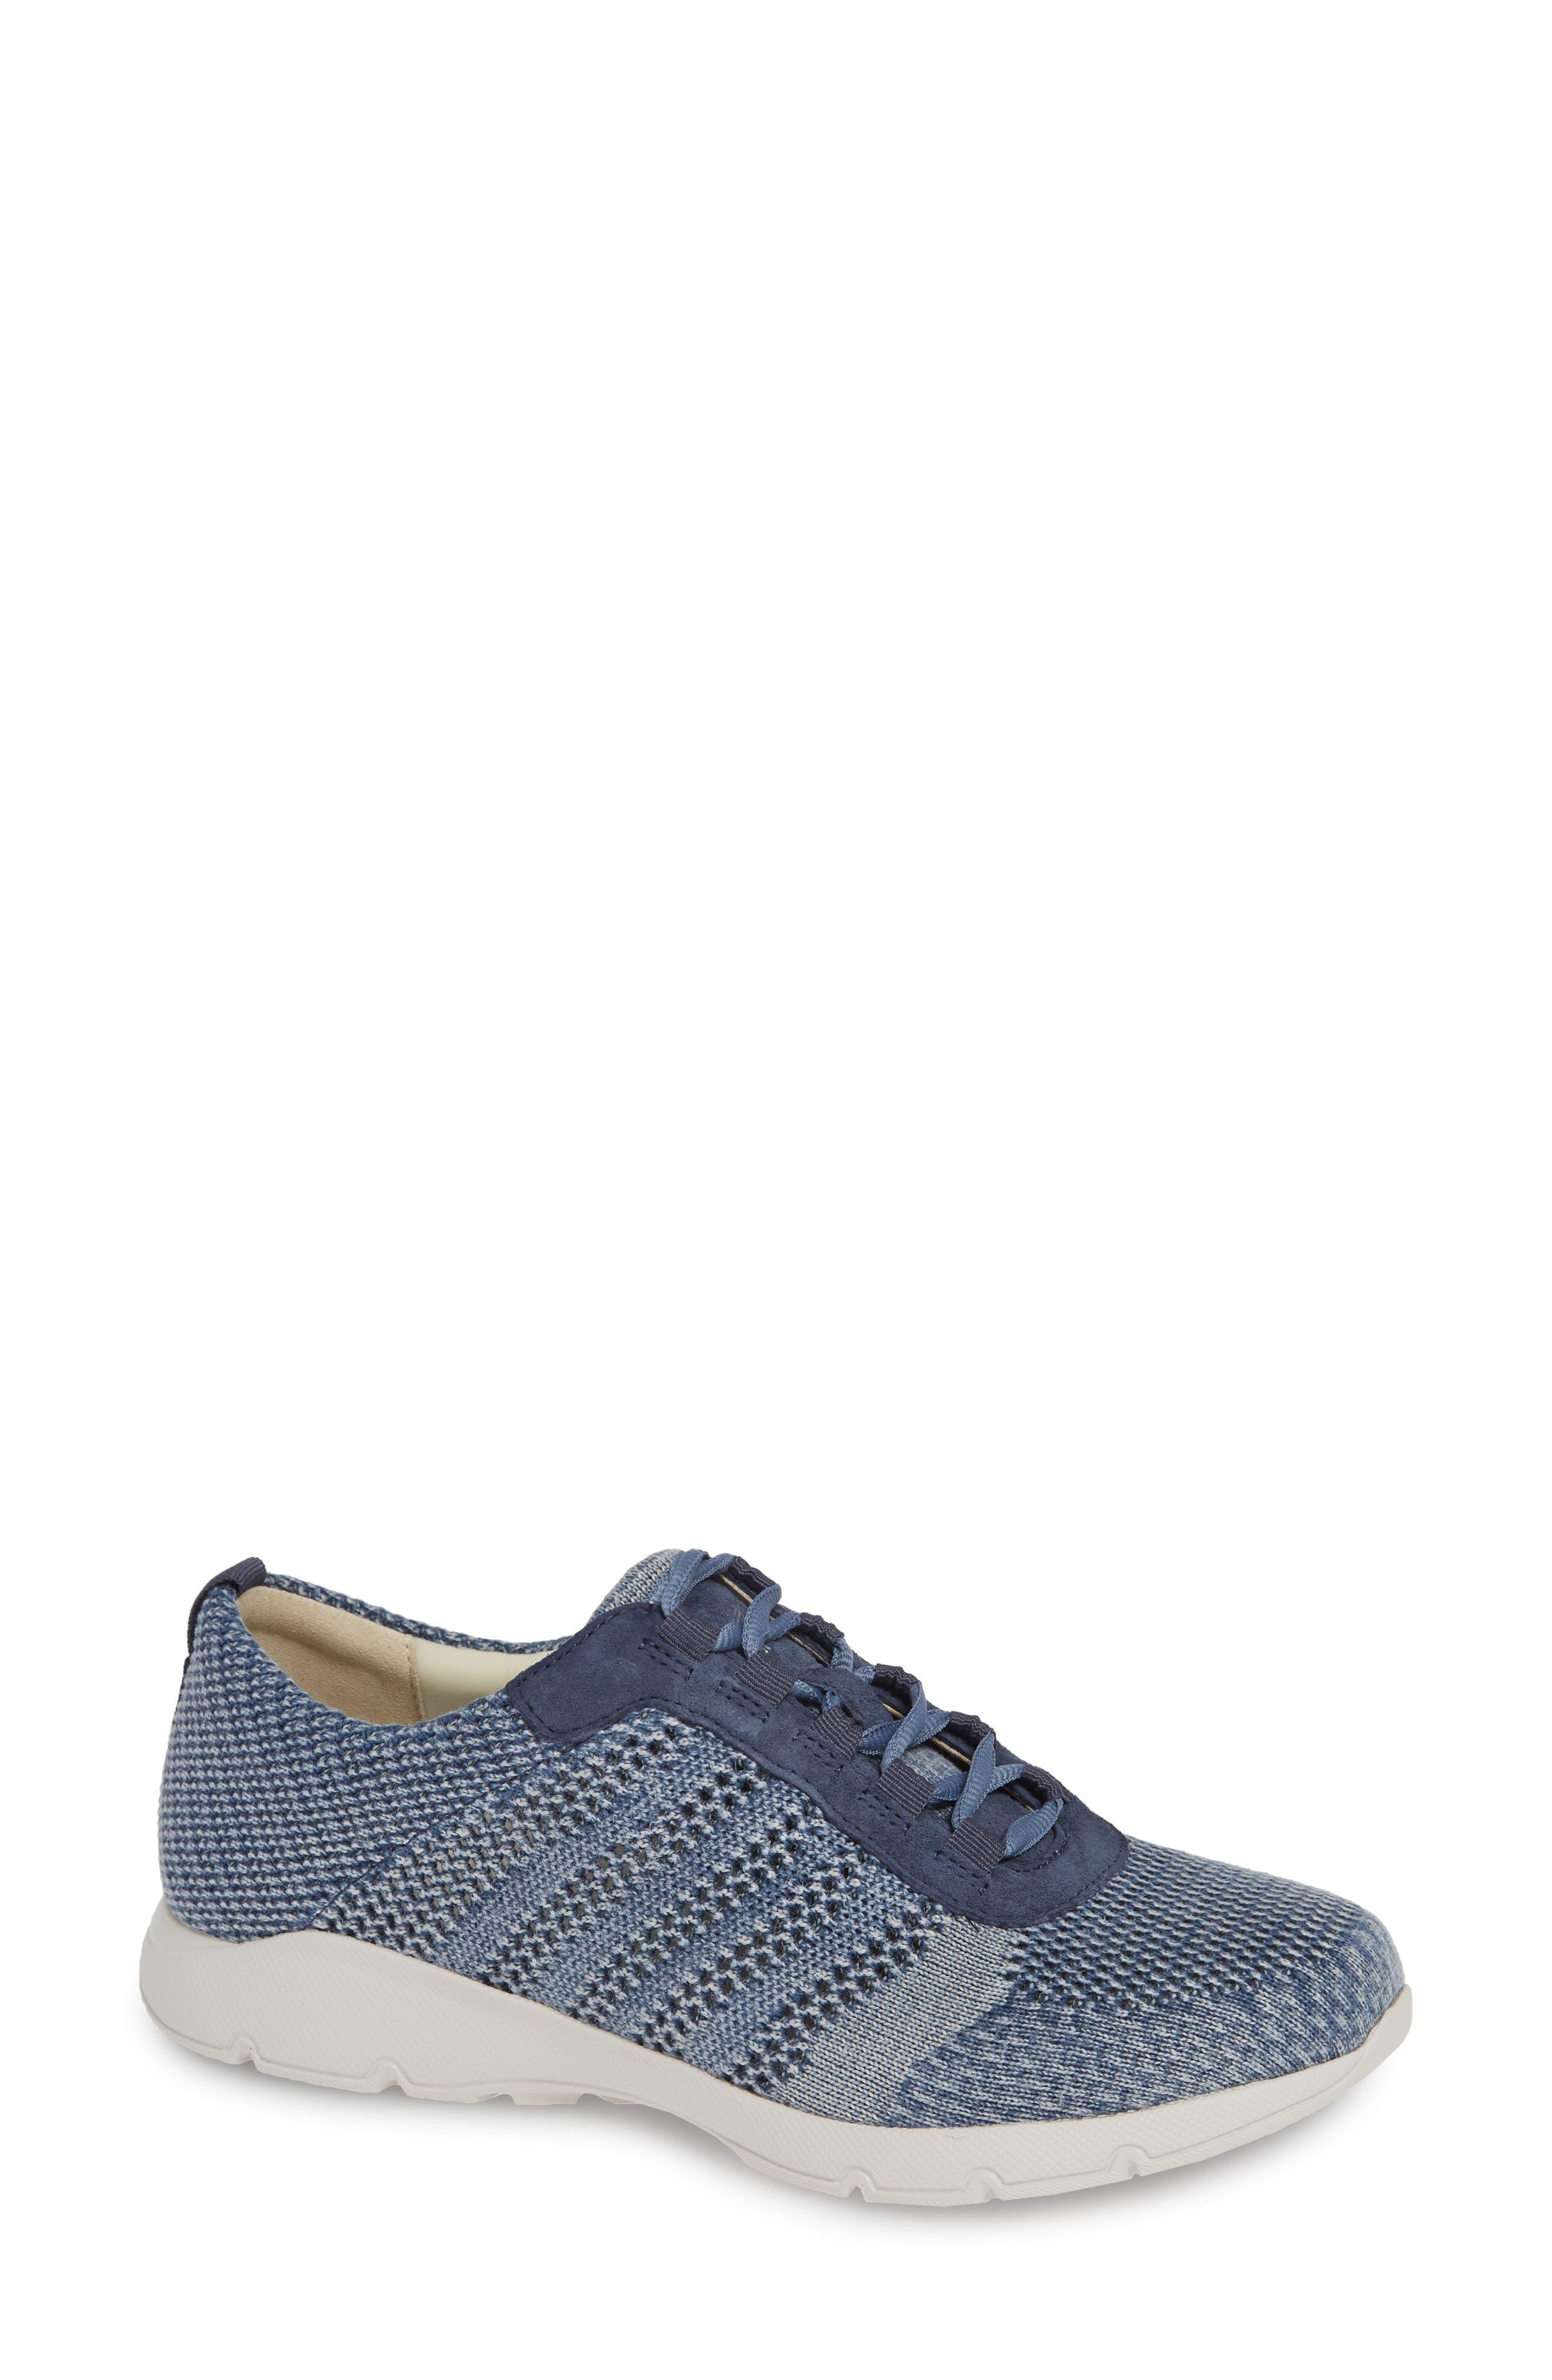 DANSKO Adrianne Sneaker, Main, color, DENIM